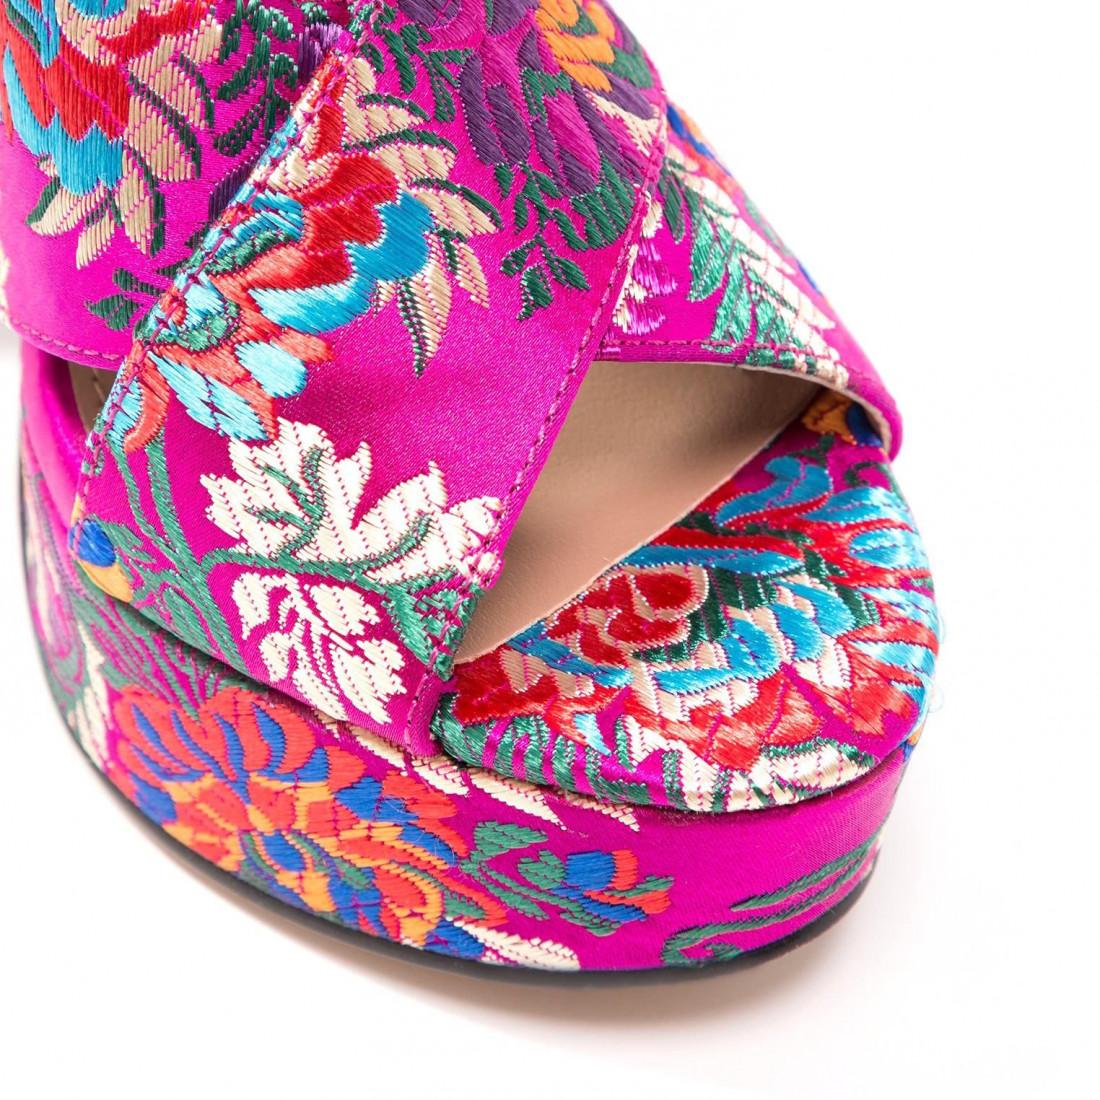 sandals woman steve madden smsjodipinkm 2647